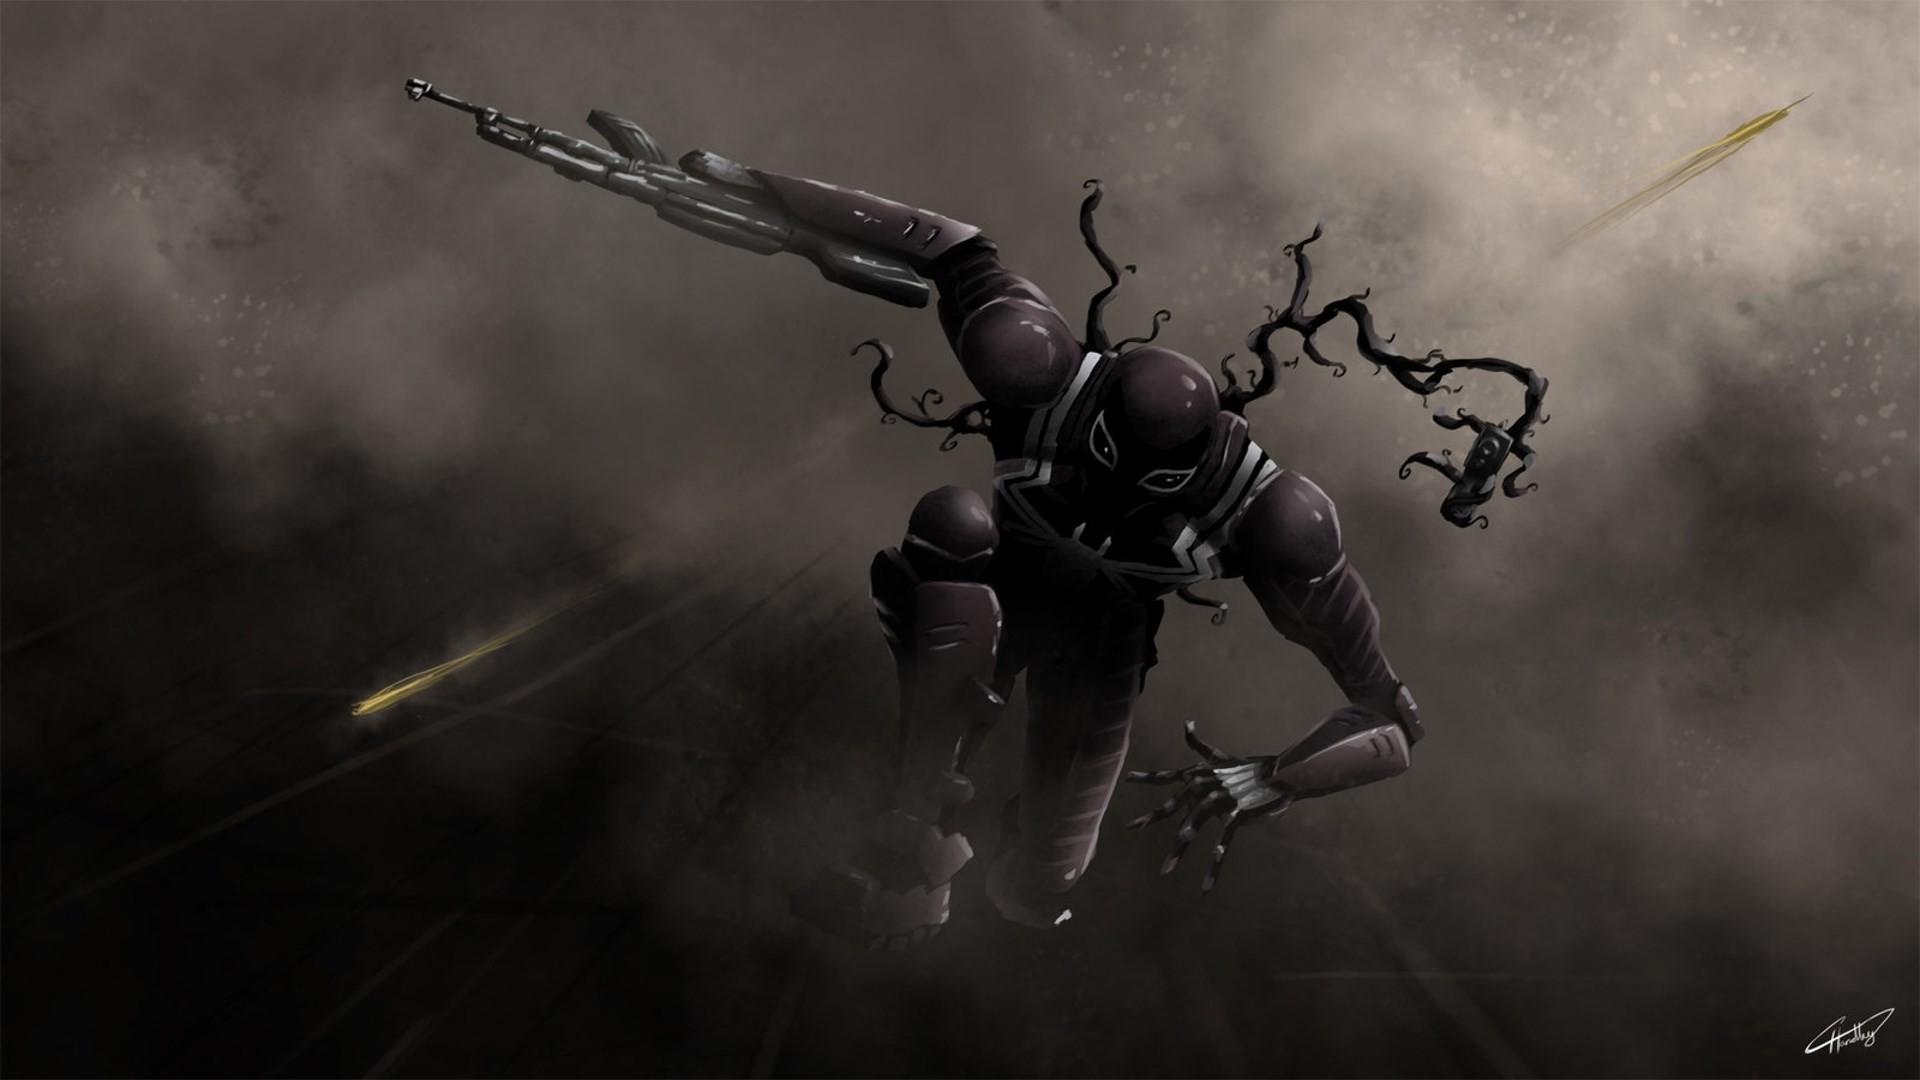 agent venom picture – Background hd, Goode Backer 2017-03-22